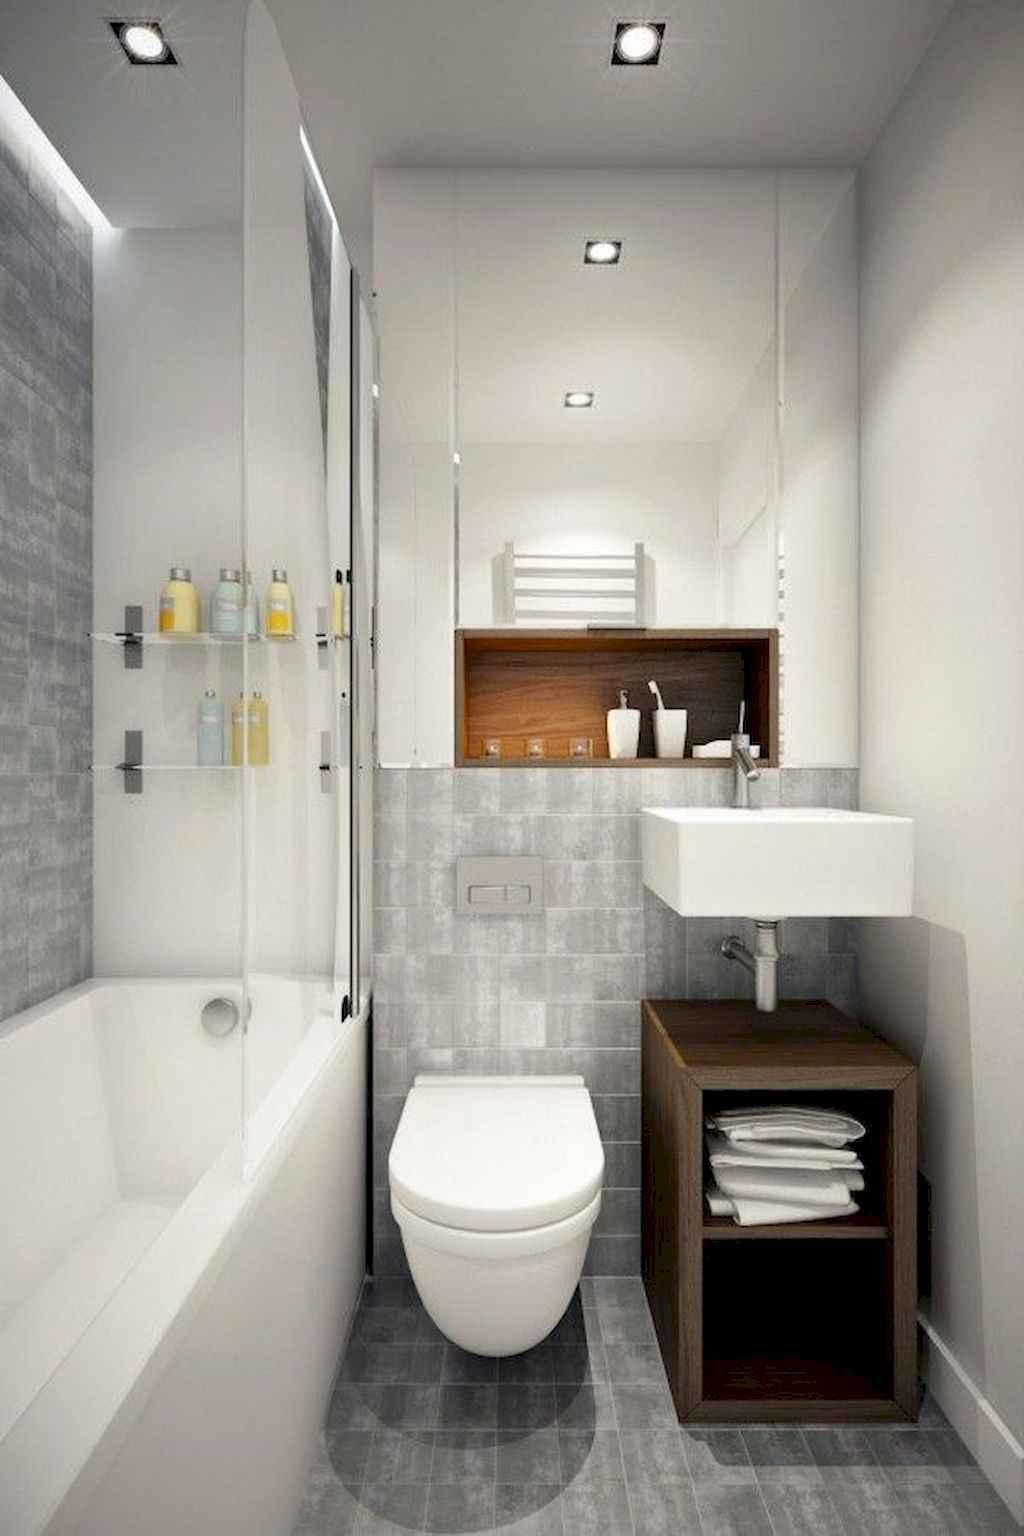 111 Brilliant Small Bathroom Remodel Ideas On A Budget (29)